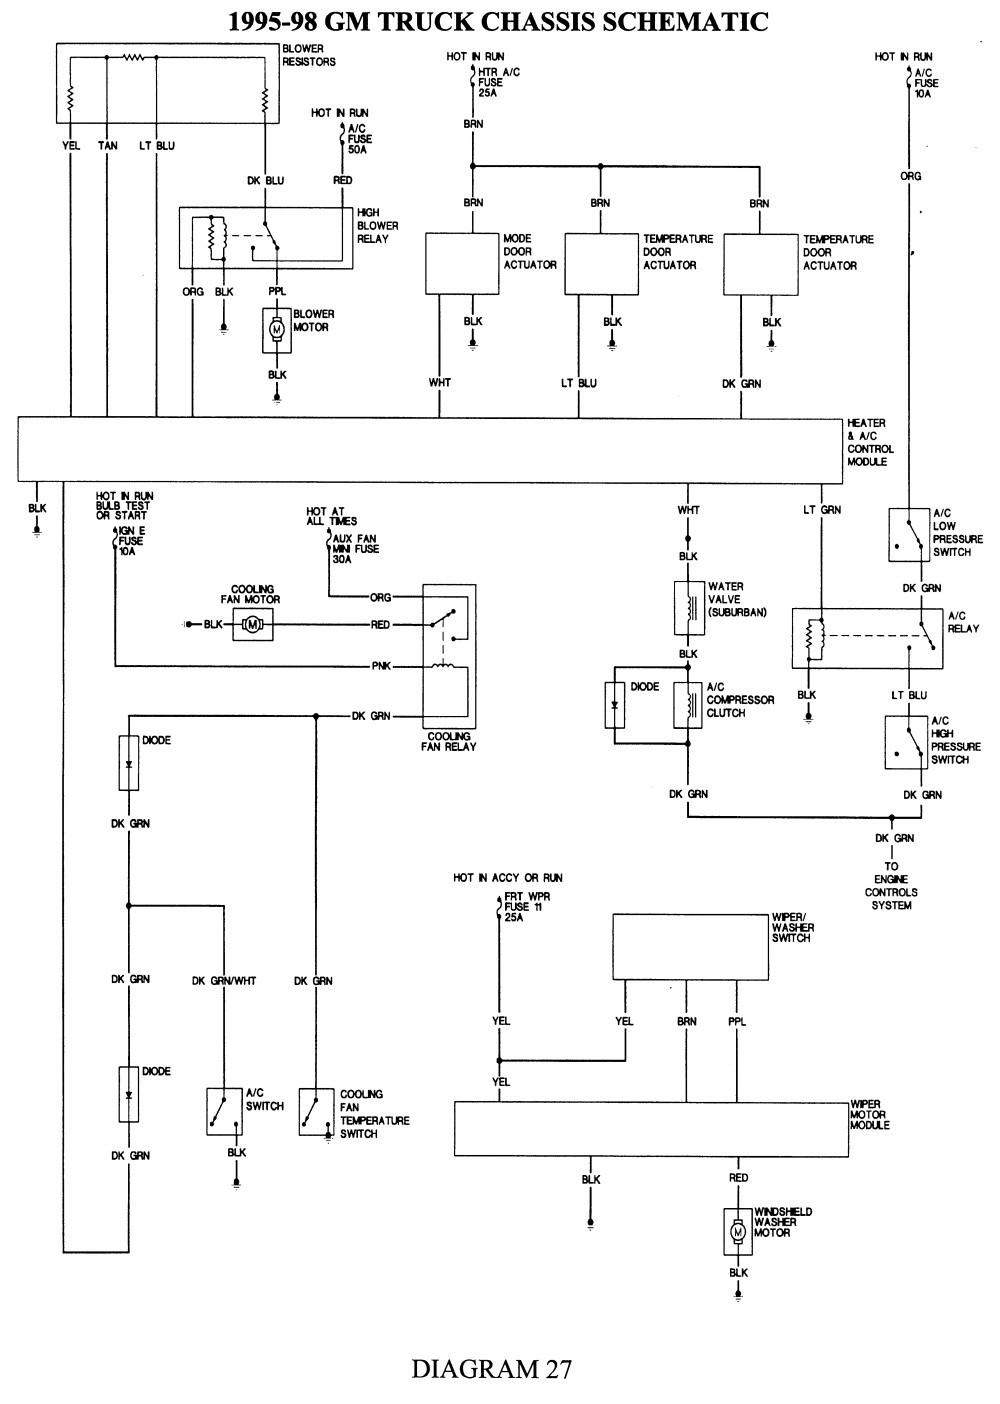 medium resolution of 1976 chevy gmc p10 p20 p30 wiring diagram stepvan motorhome p15